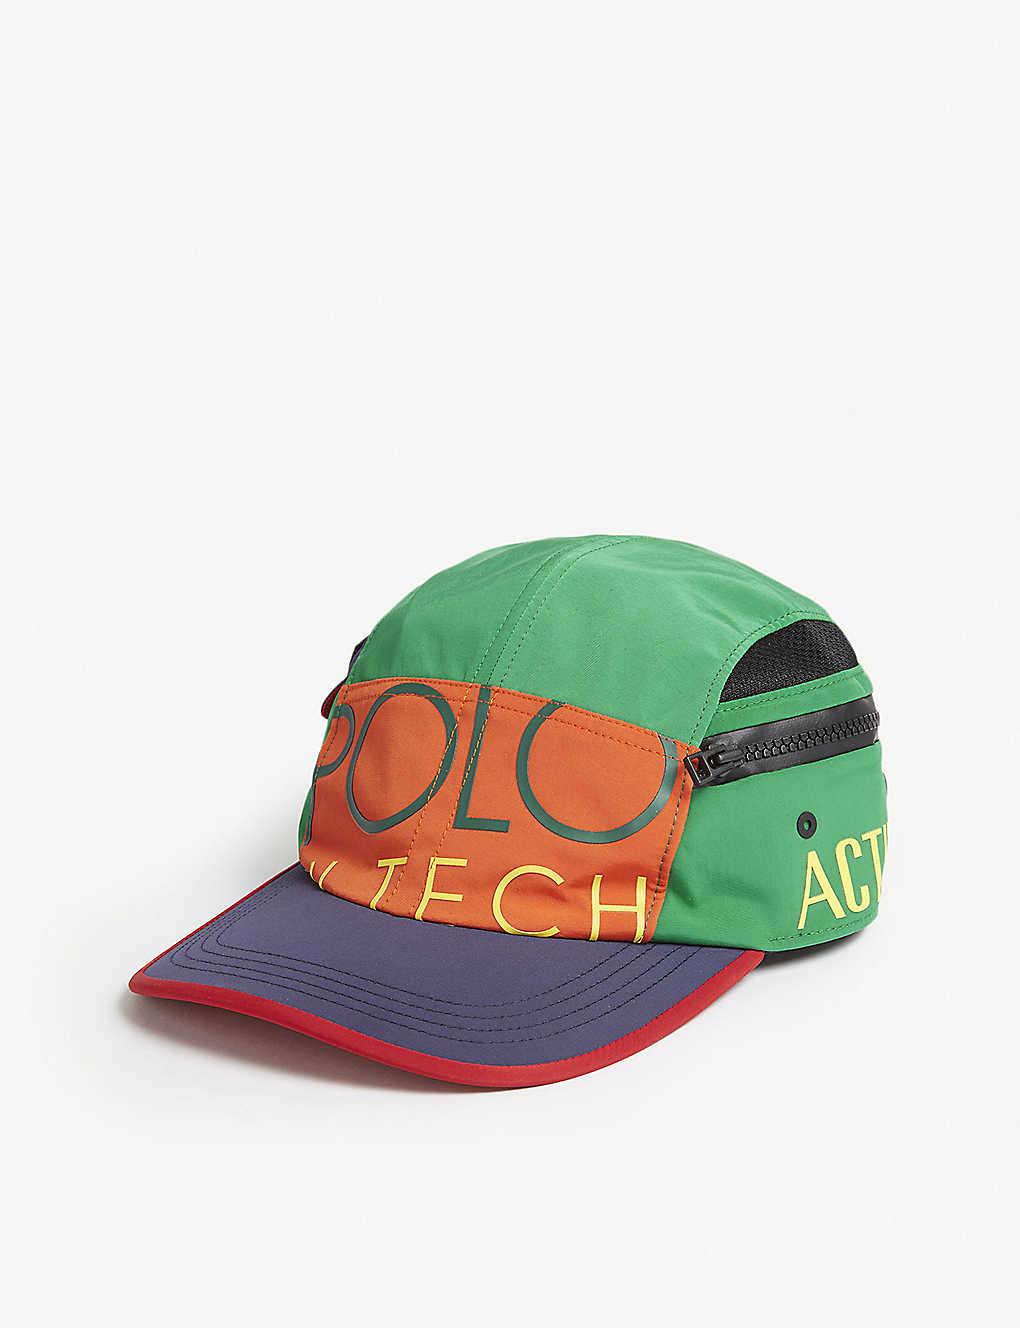 e30c8c81c5a POLO RALPH LAUREN - Hi Tech nylon cap